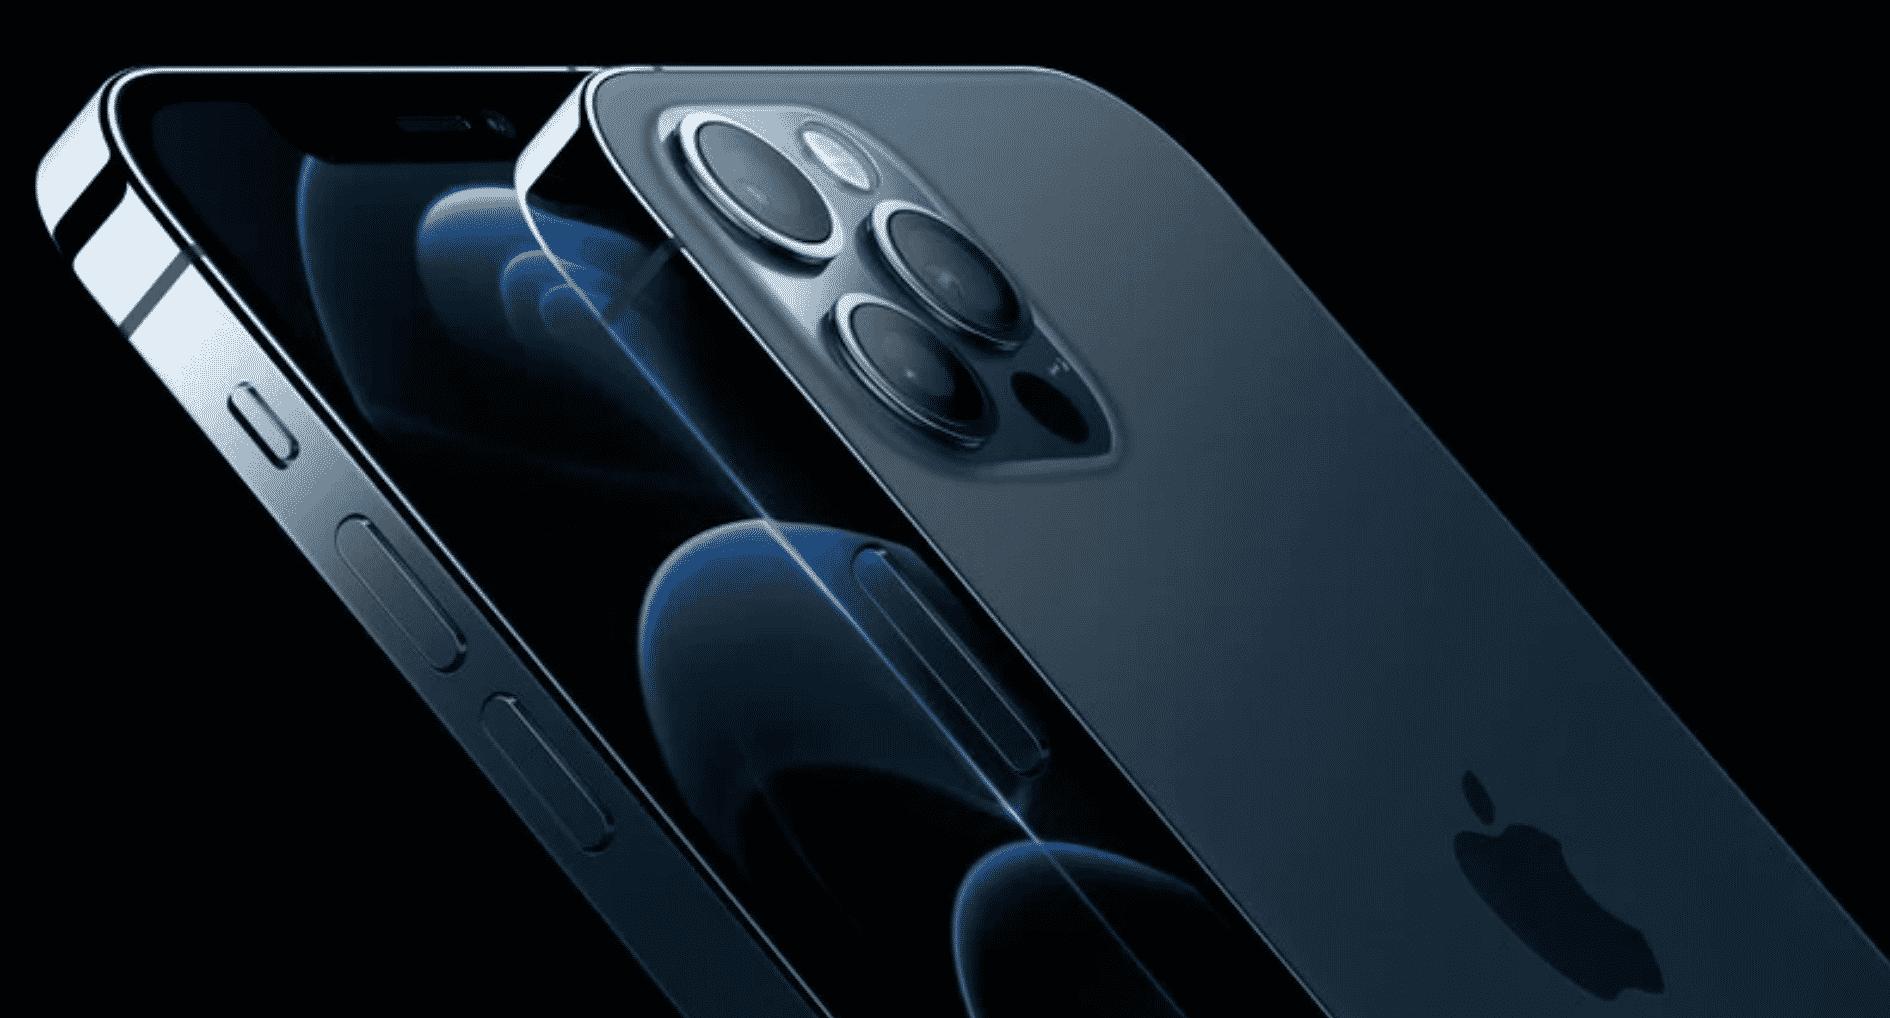 iPhone 12 Pro's Camera